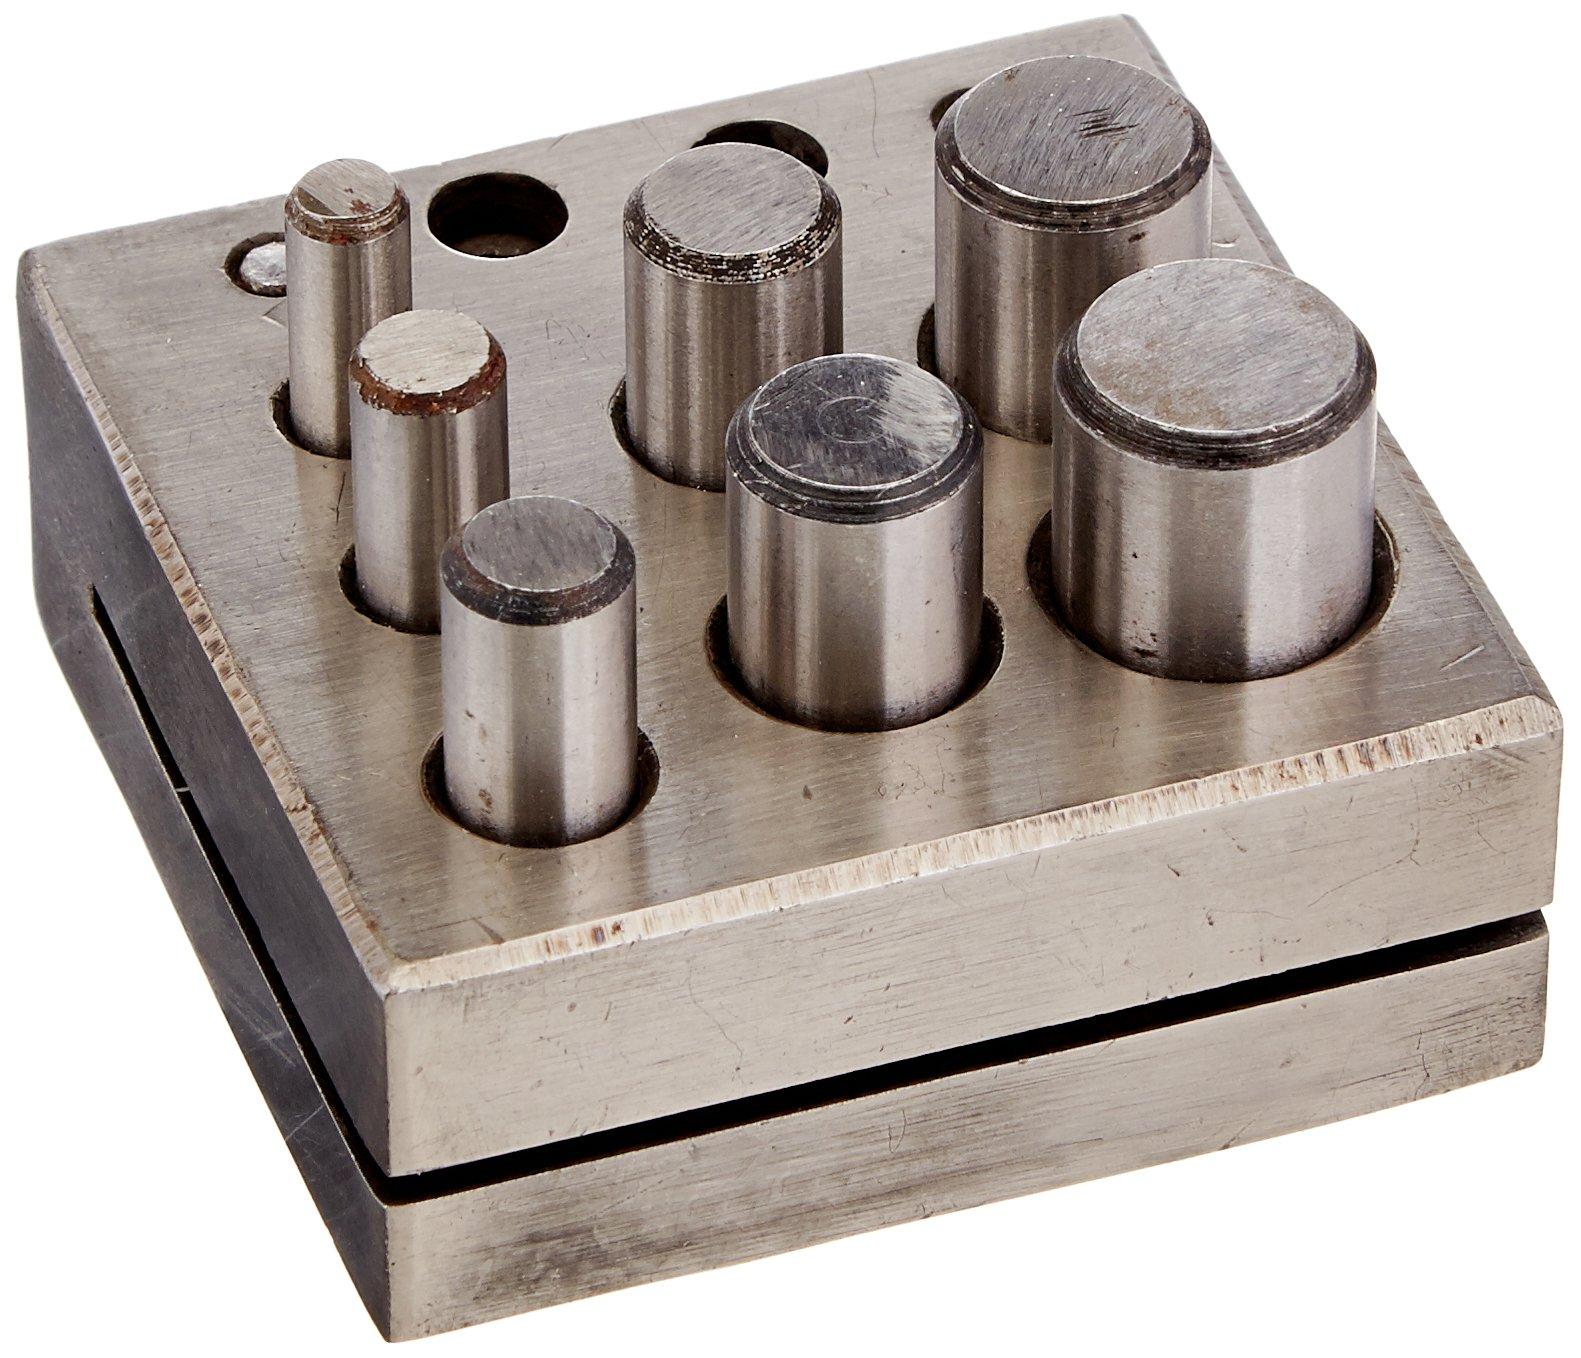 SE JT-SP307 Disc Cutter Set (7 Piece)